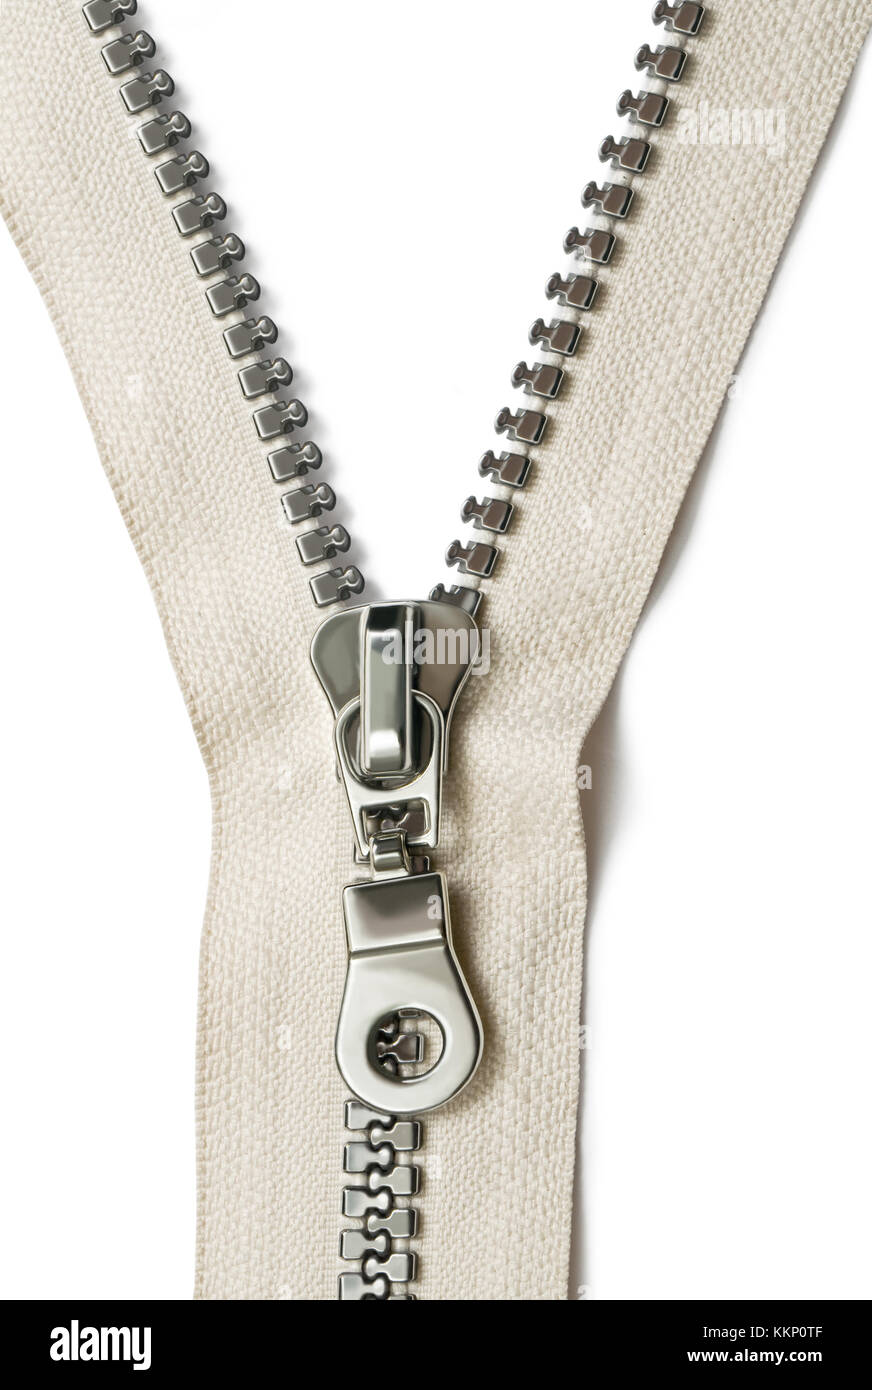 Closeup of zipper on white background - Stock Image